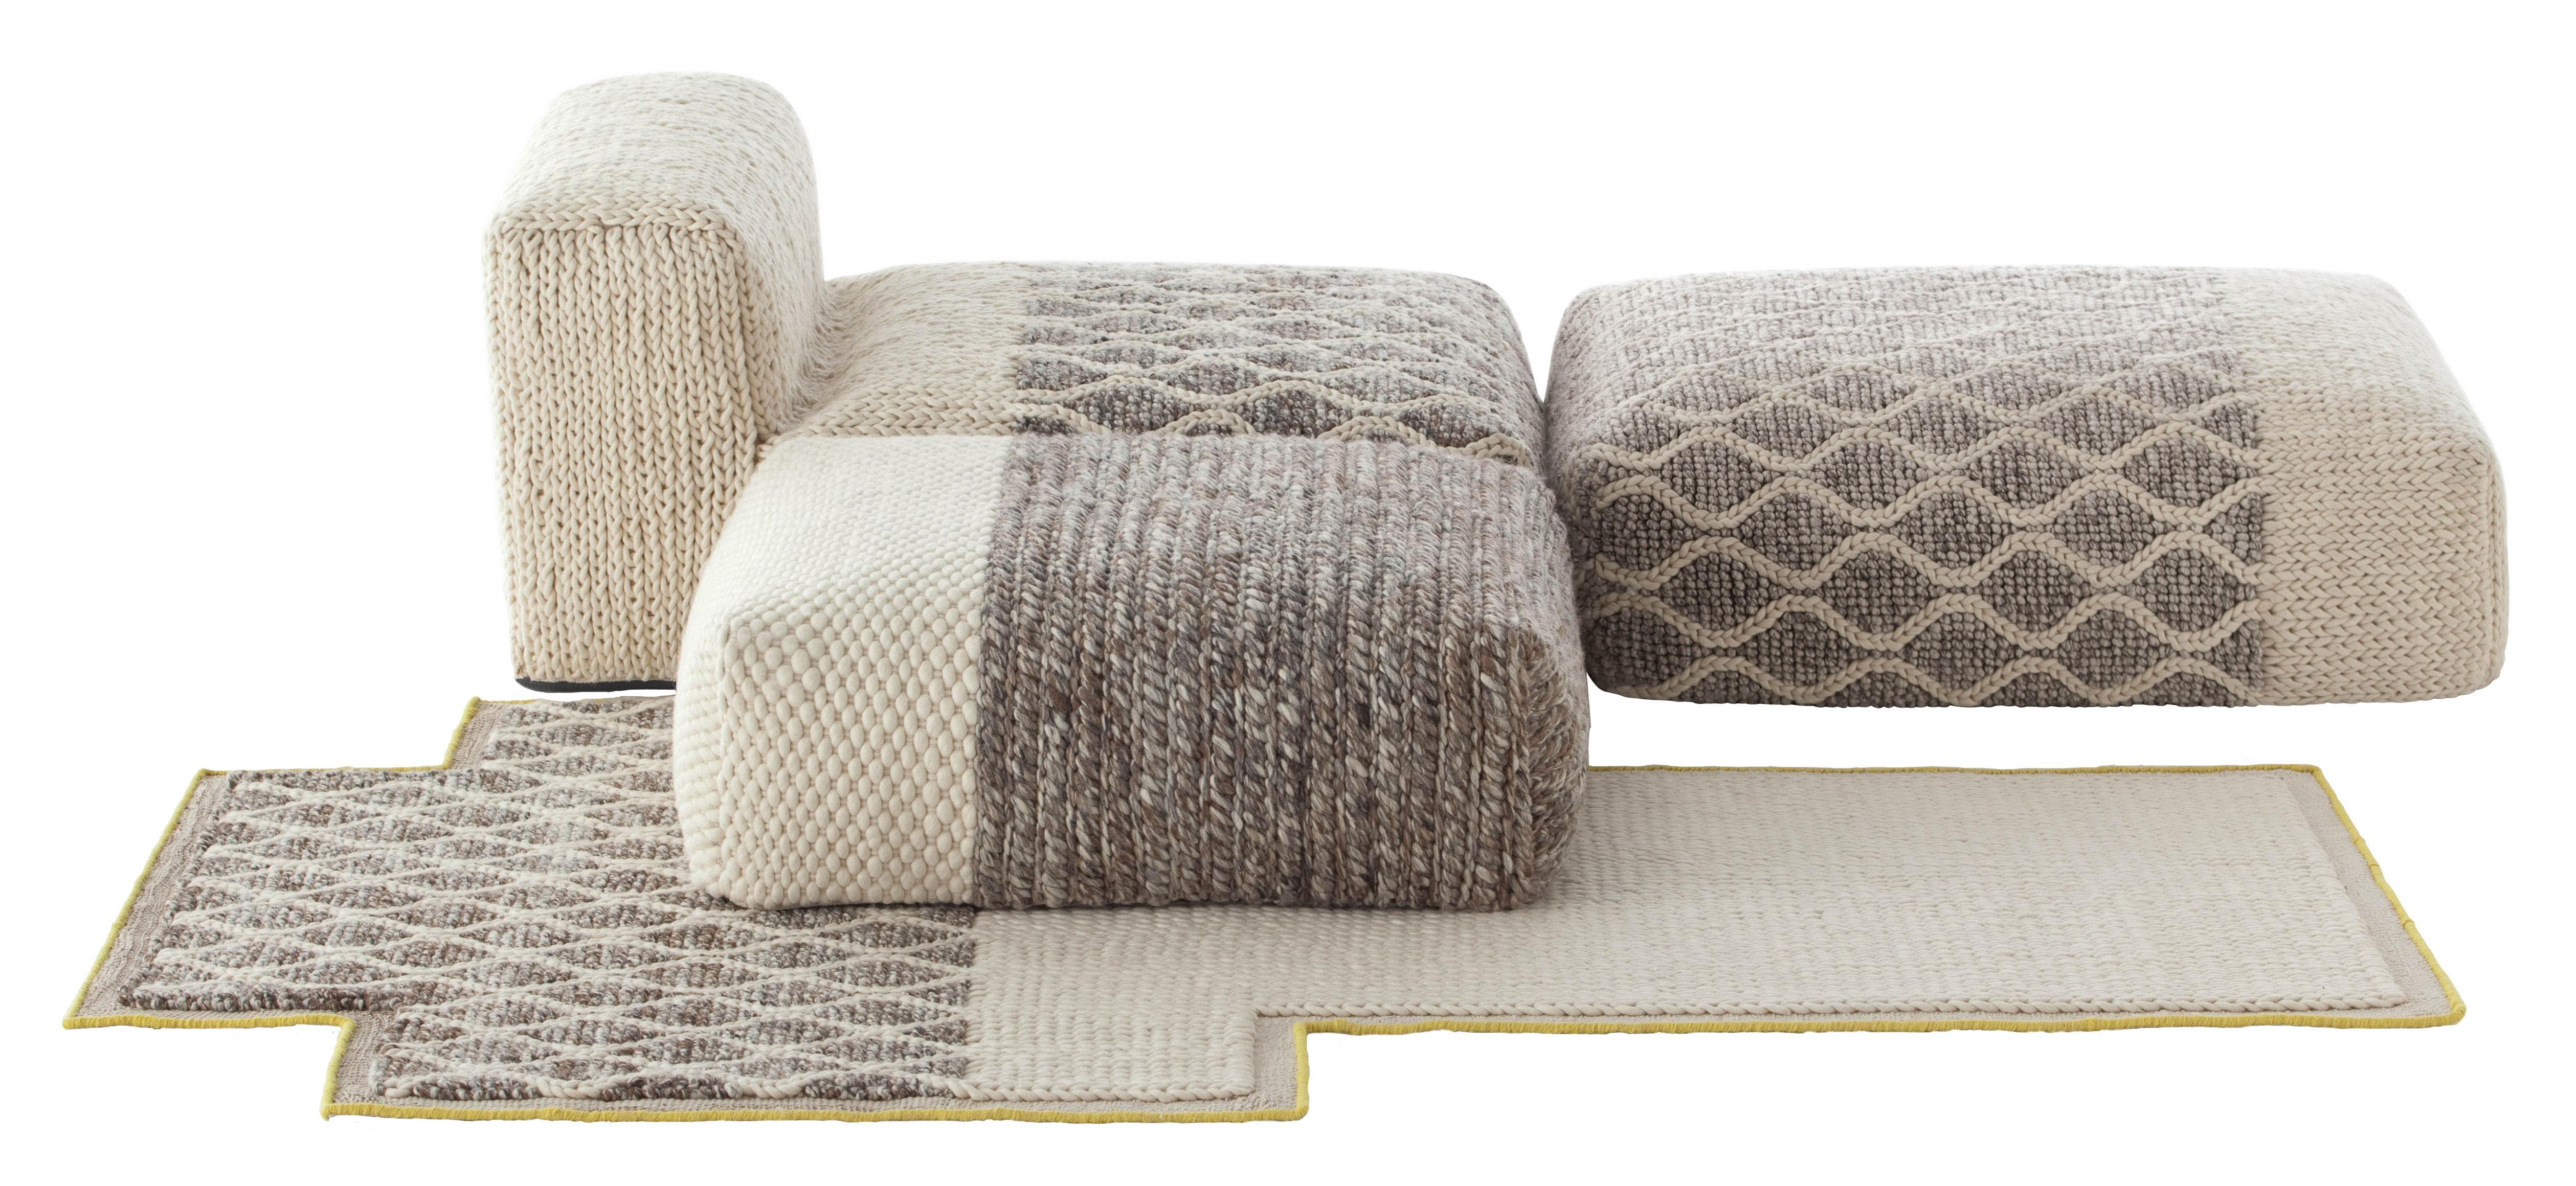 Möbel - Lounge Sessel - n°2 Mangas Space Sofa modulierbar / 1 Chaiselongue + 2 Sitzhocker + 1 Teppich - Gan - Elfenbeinfarben - Laine vierge, Mousse caoutchouc